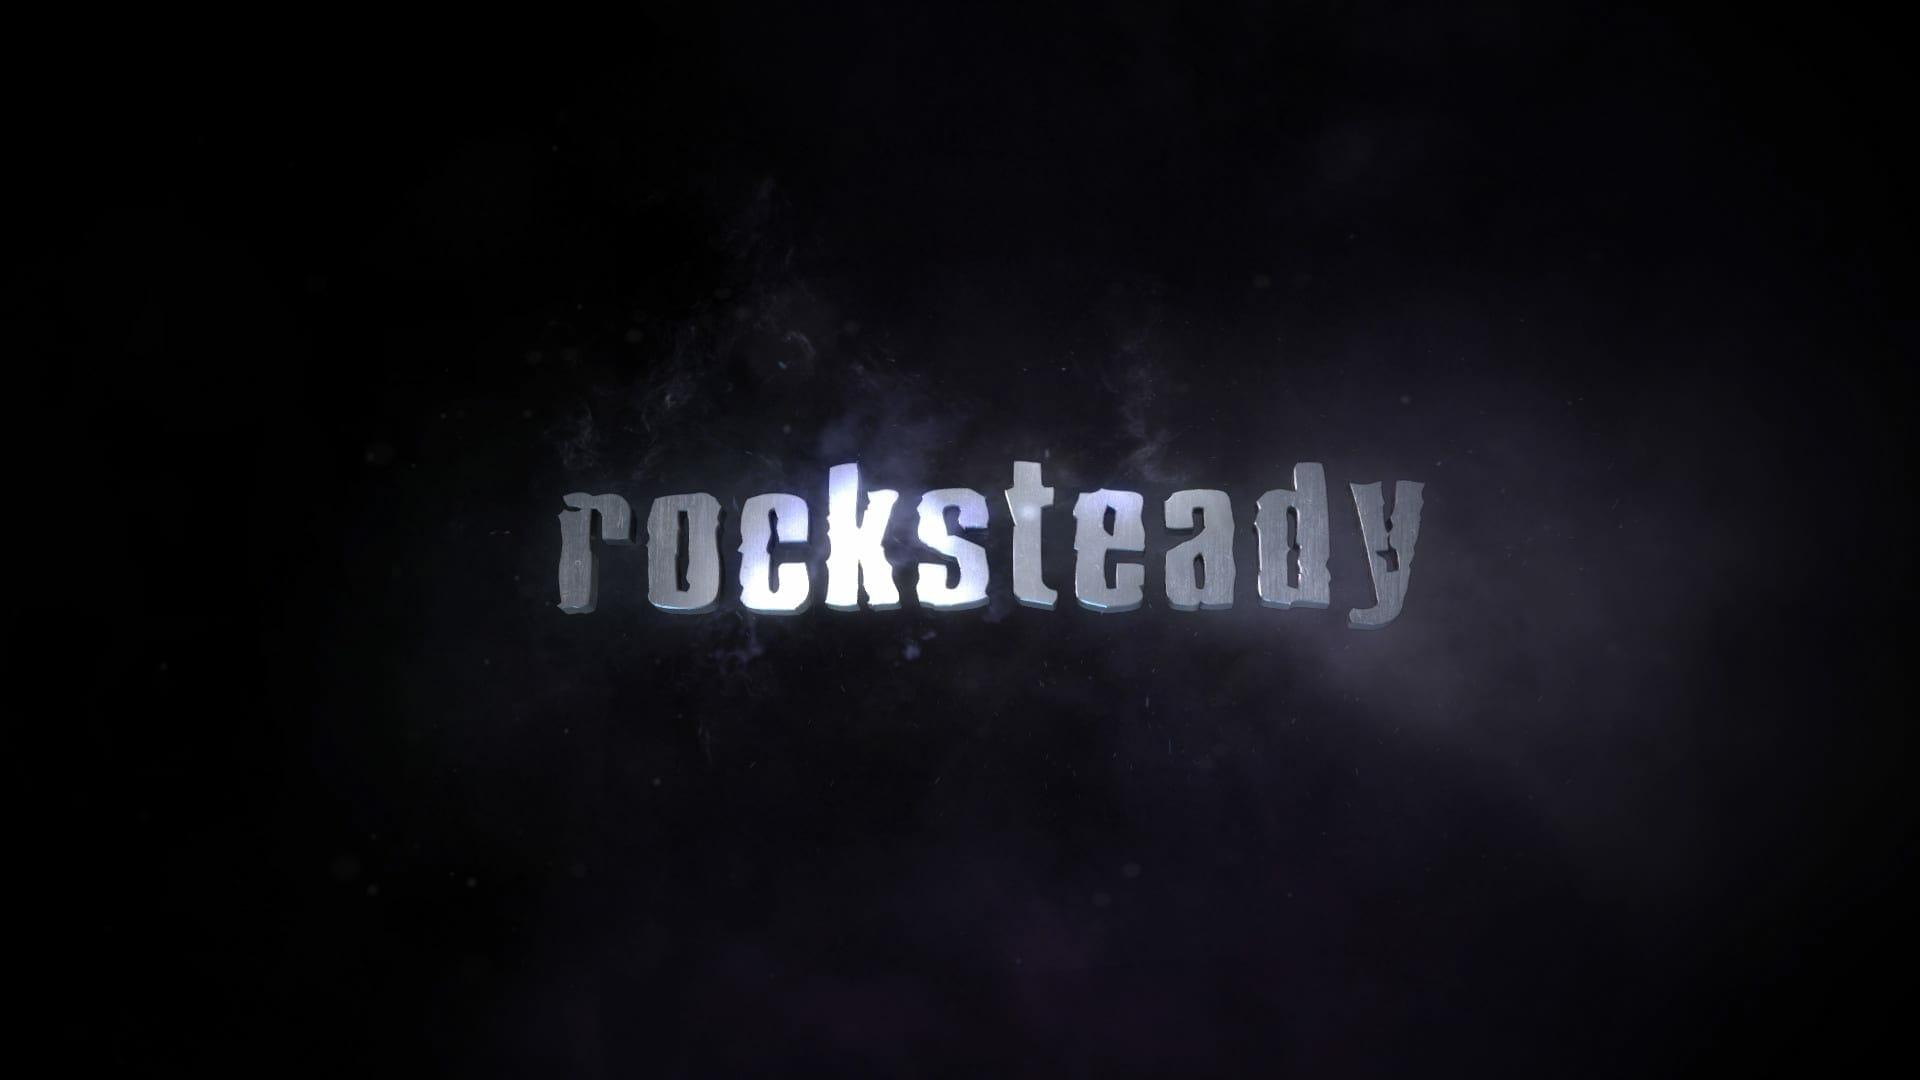 Rocksteady Celebrating Milestone